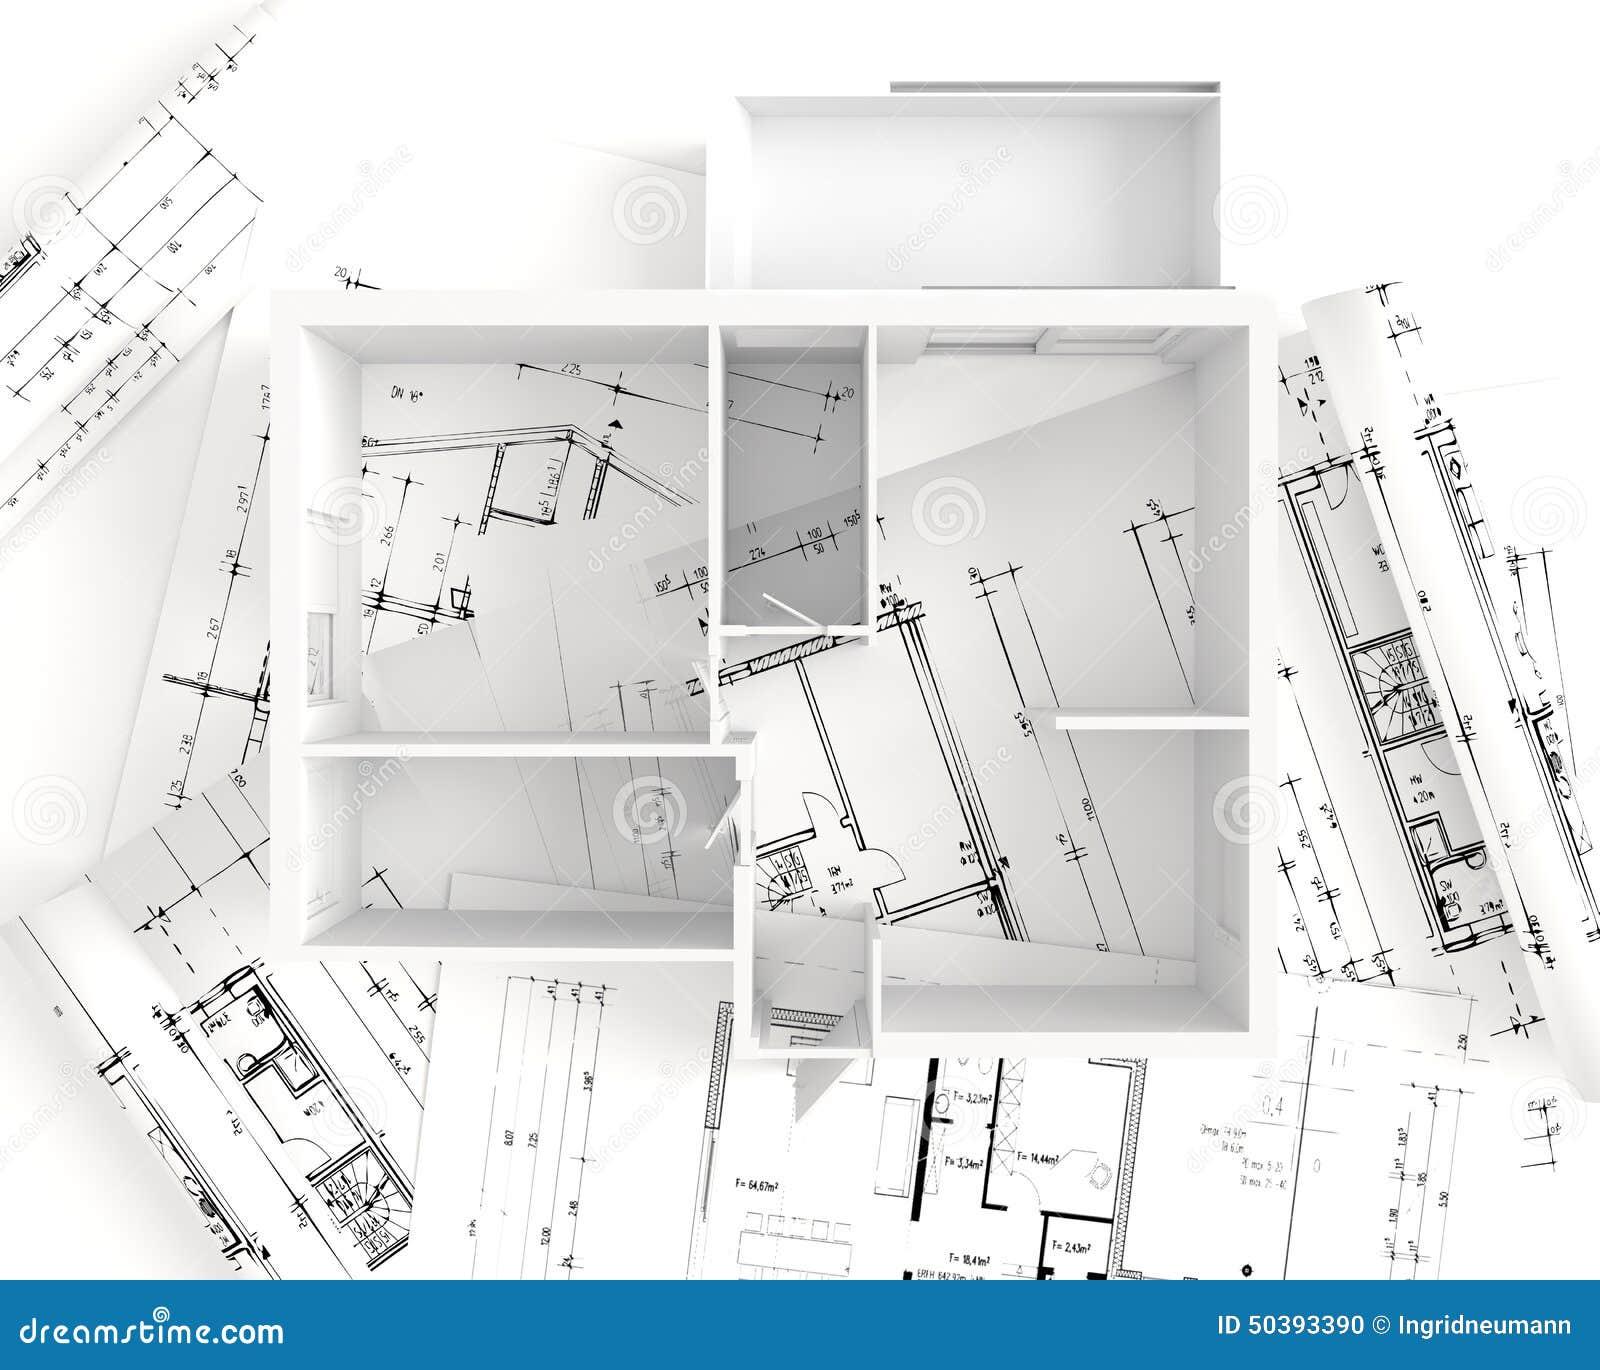 house plan top view interior design stock illustration